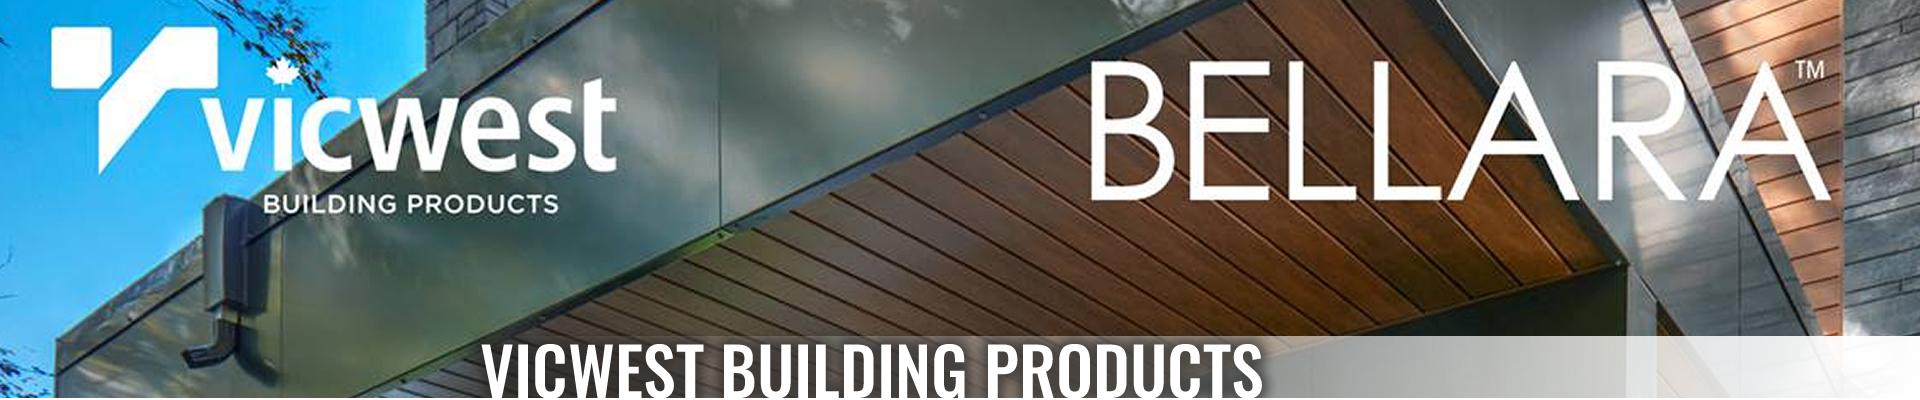 VicWest Steel - Bellara Siding at Turkstra Lumber-Designer Showcase (Windows, doors, trim, hardware, columns, decks). Visit one of 11 convenient locations across Southwestern Ontario.